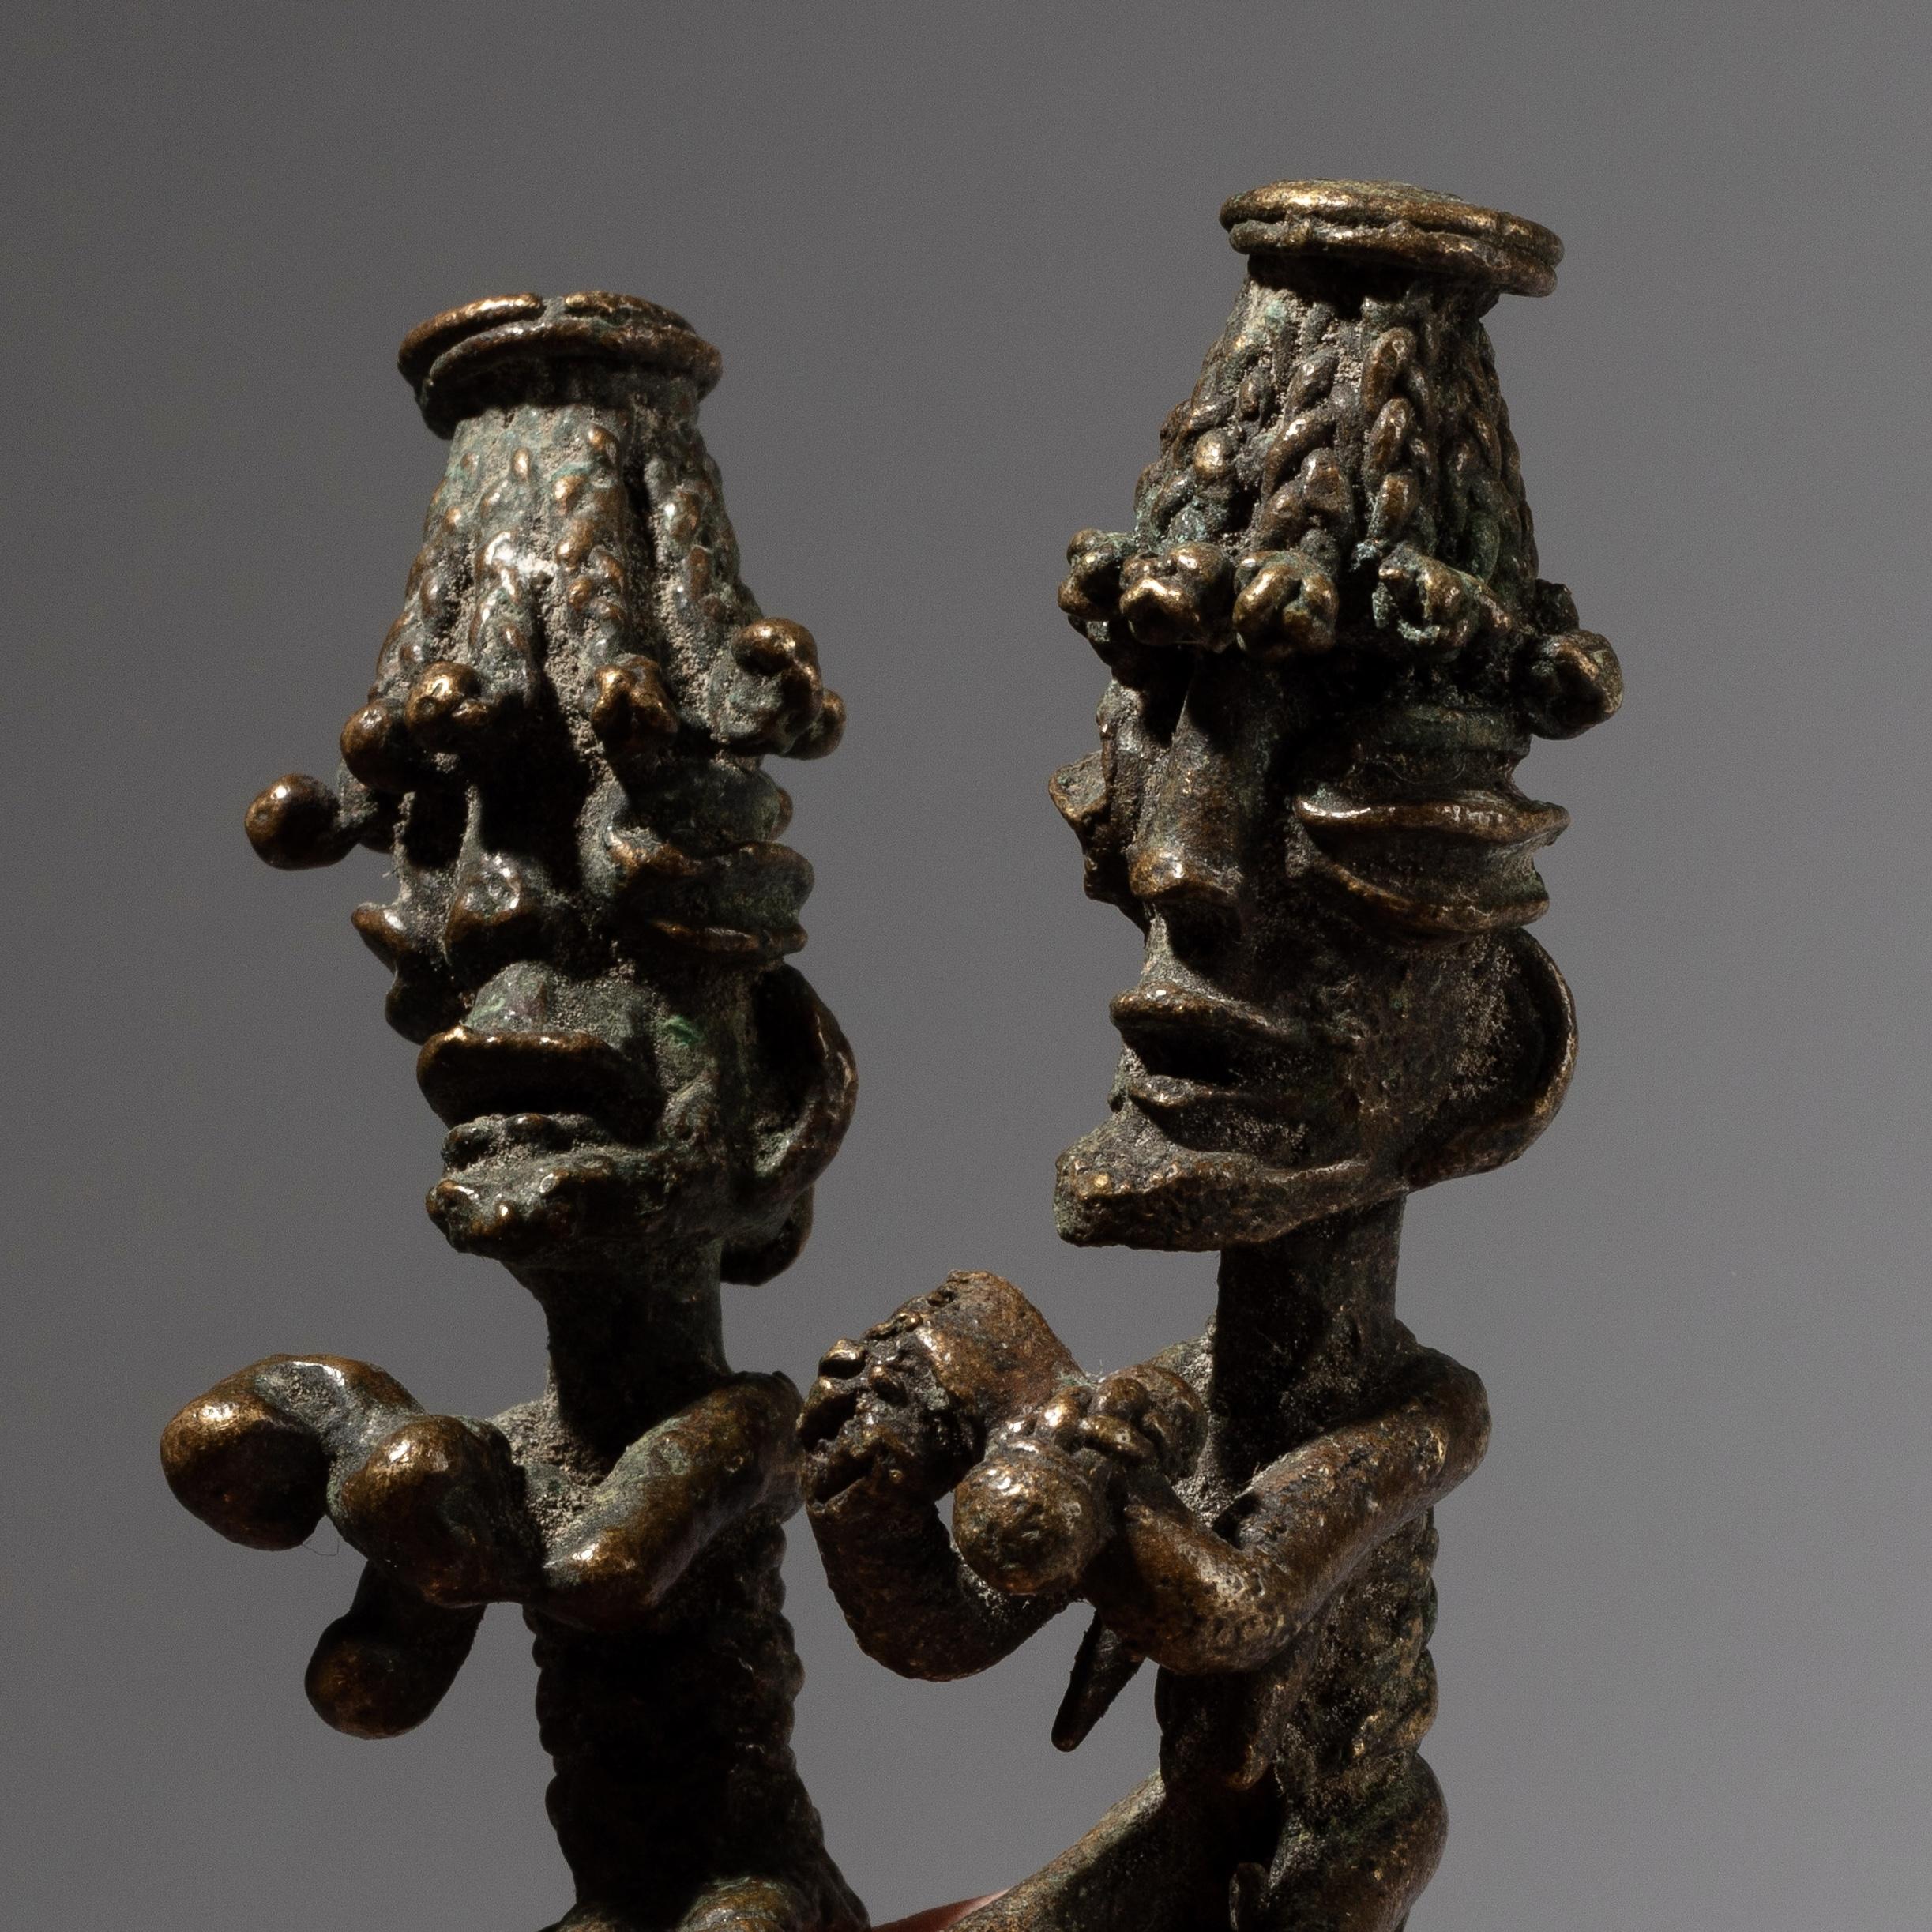 DA BIZARRE PAIR OF OGBONI BRONZE FIGURES, YORUBA TRIBE OF NIGERIA ( No 4262)